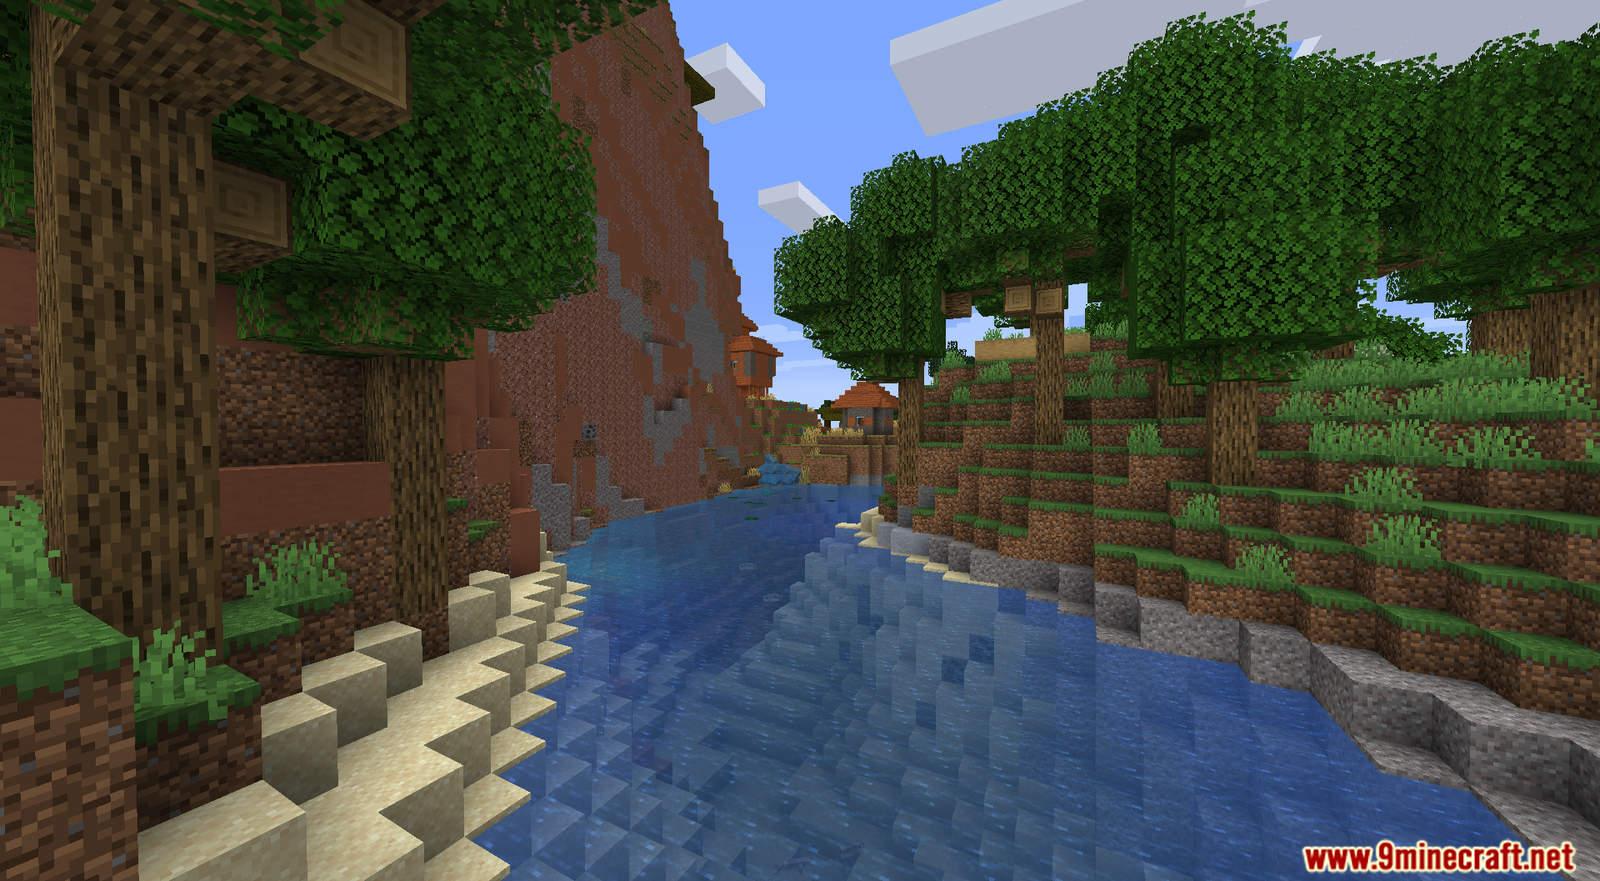 William Wythers' Overhauled Overworld Mod for Minecraft (6)